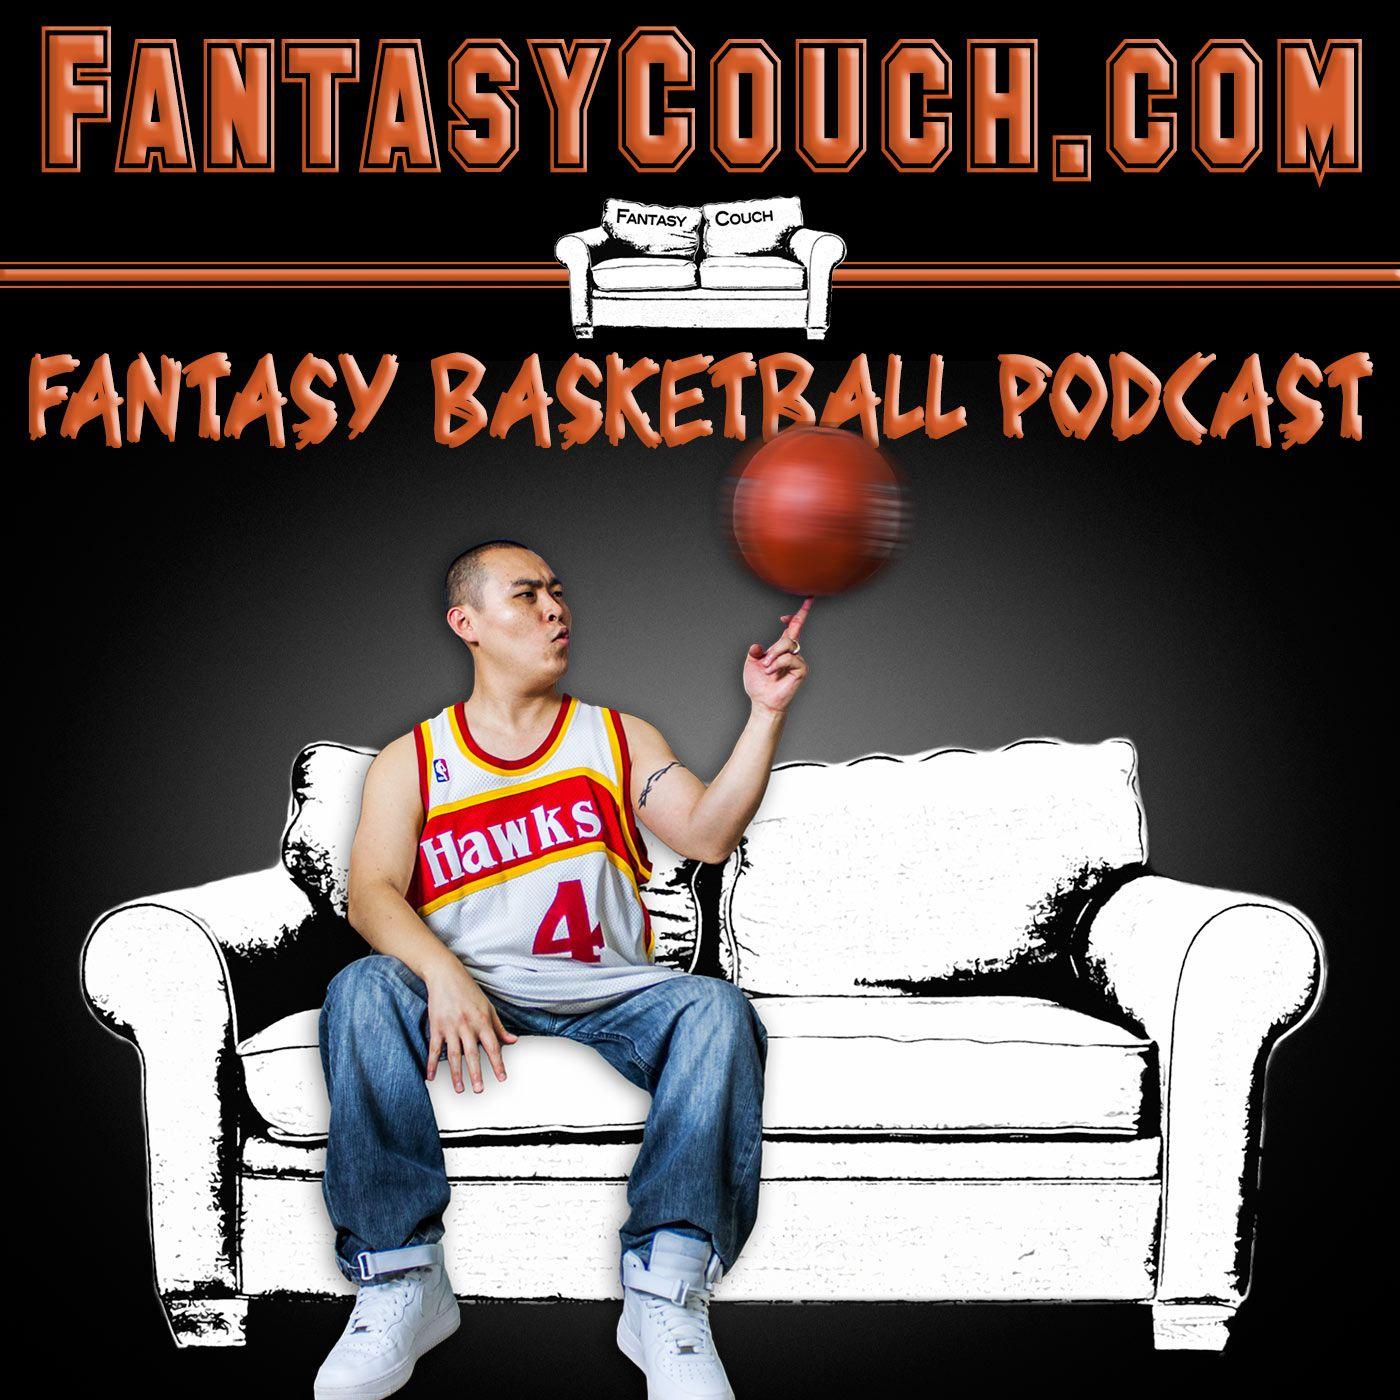 Fantasy basketball podcast rising and falling stocks